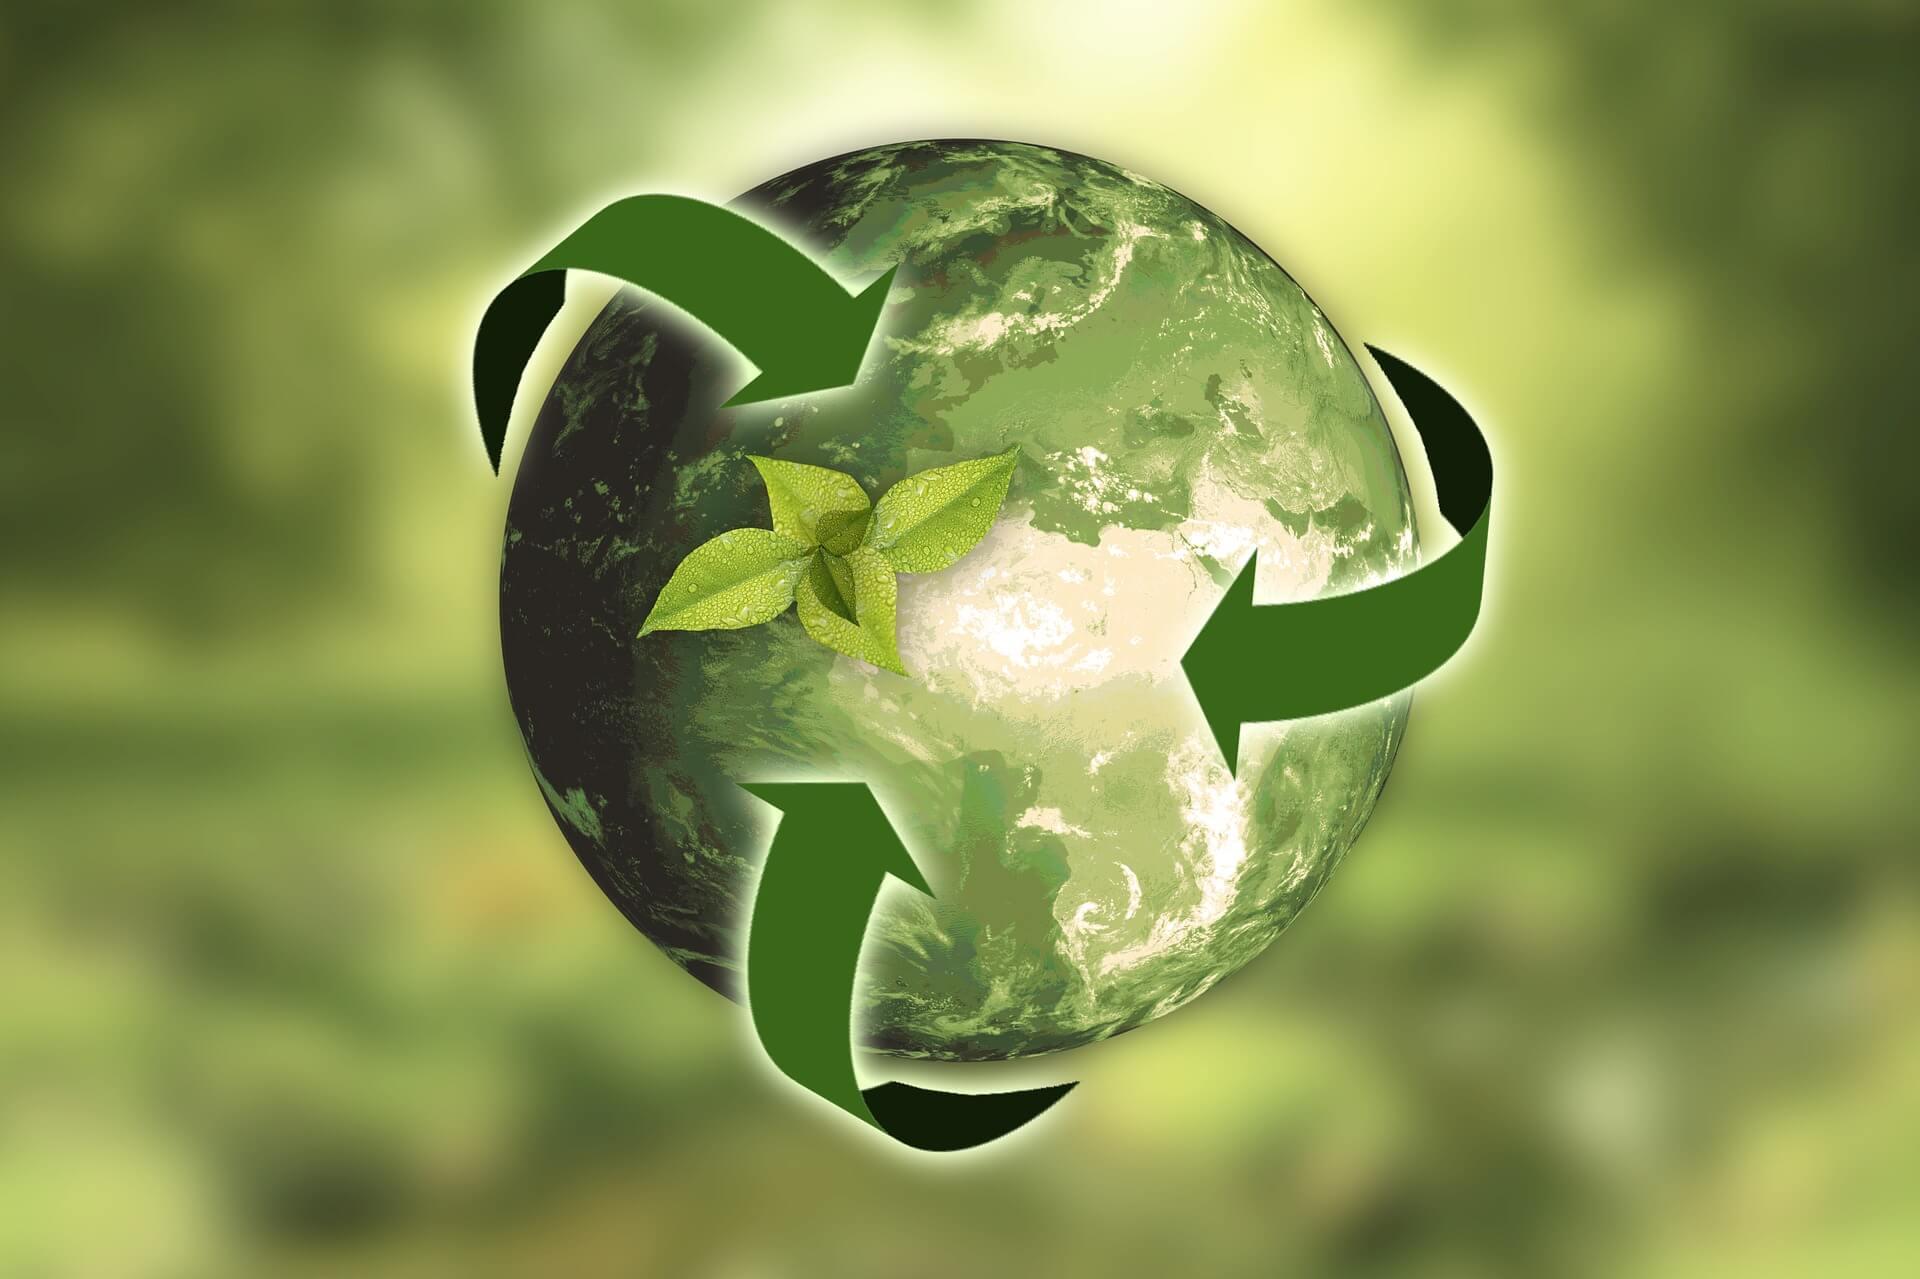 Cél: a zöld bolygó